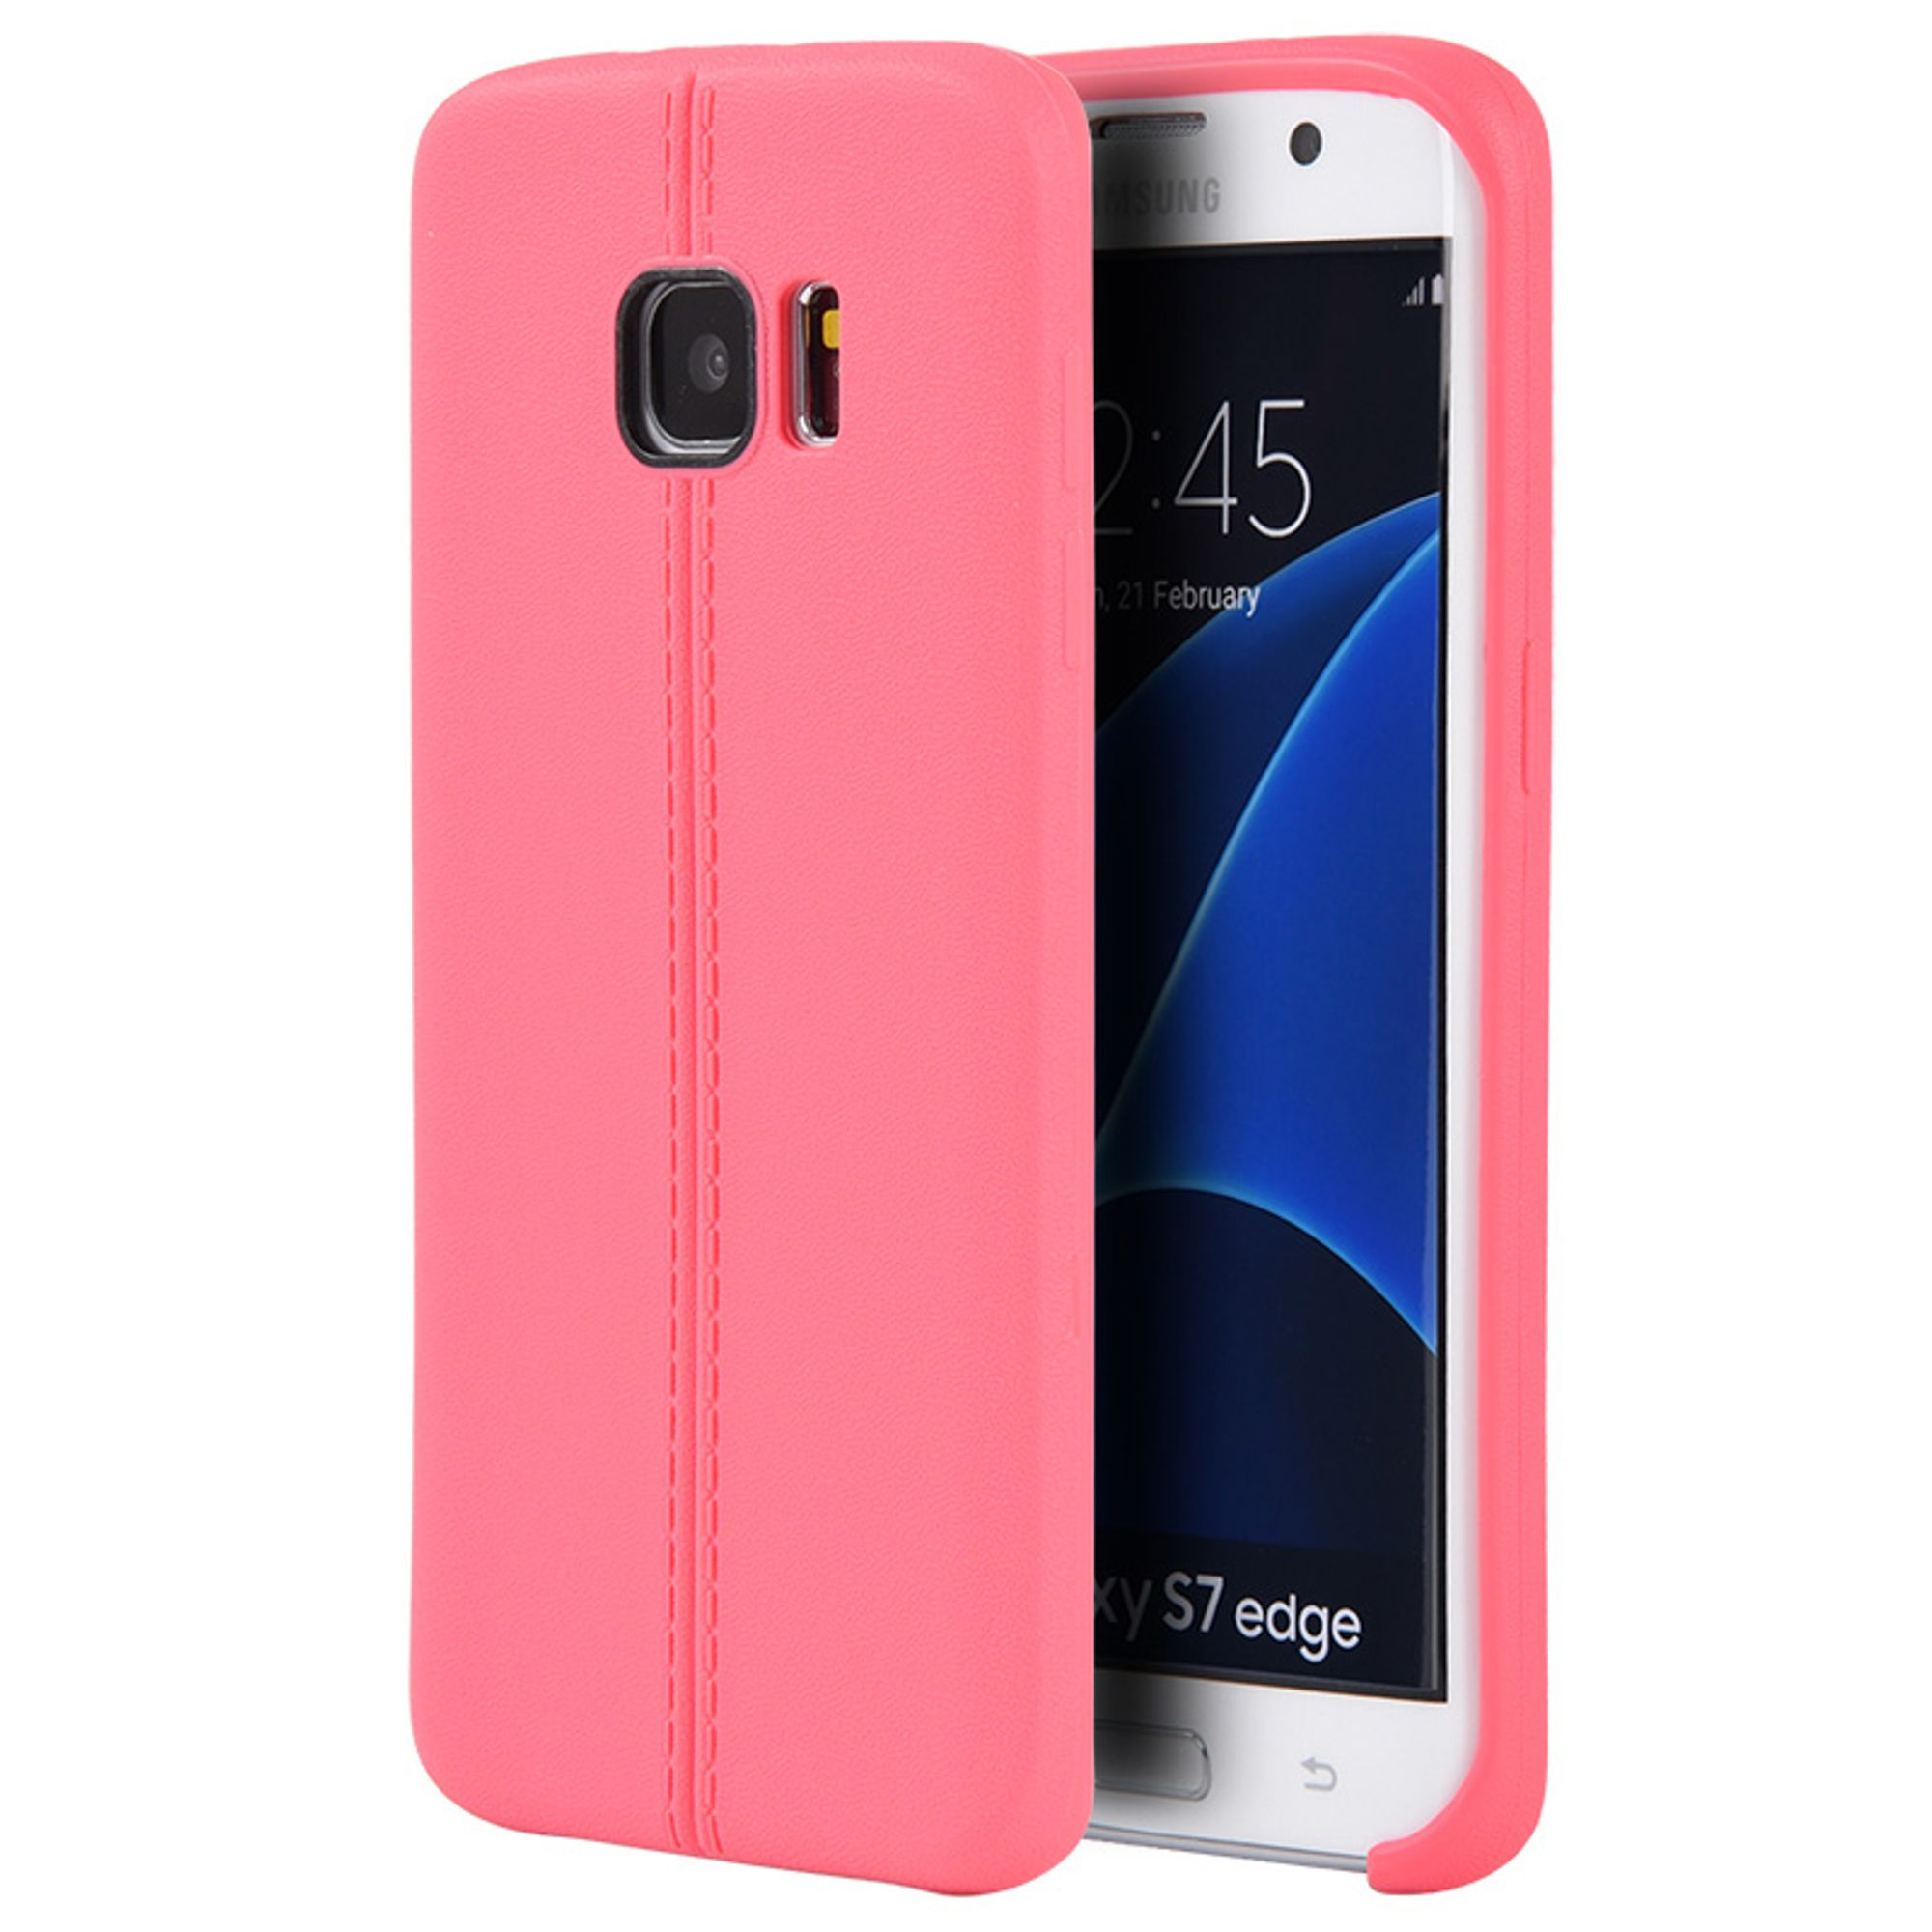 Samsung Galaxy S7 Edge Case, by Insten Slim Jacket Leather Look Finish TPU Rubber Skin Gel Case Cover For Samsung Galaxy S7 Edge